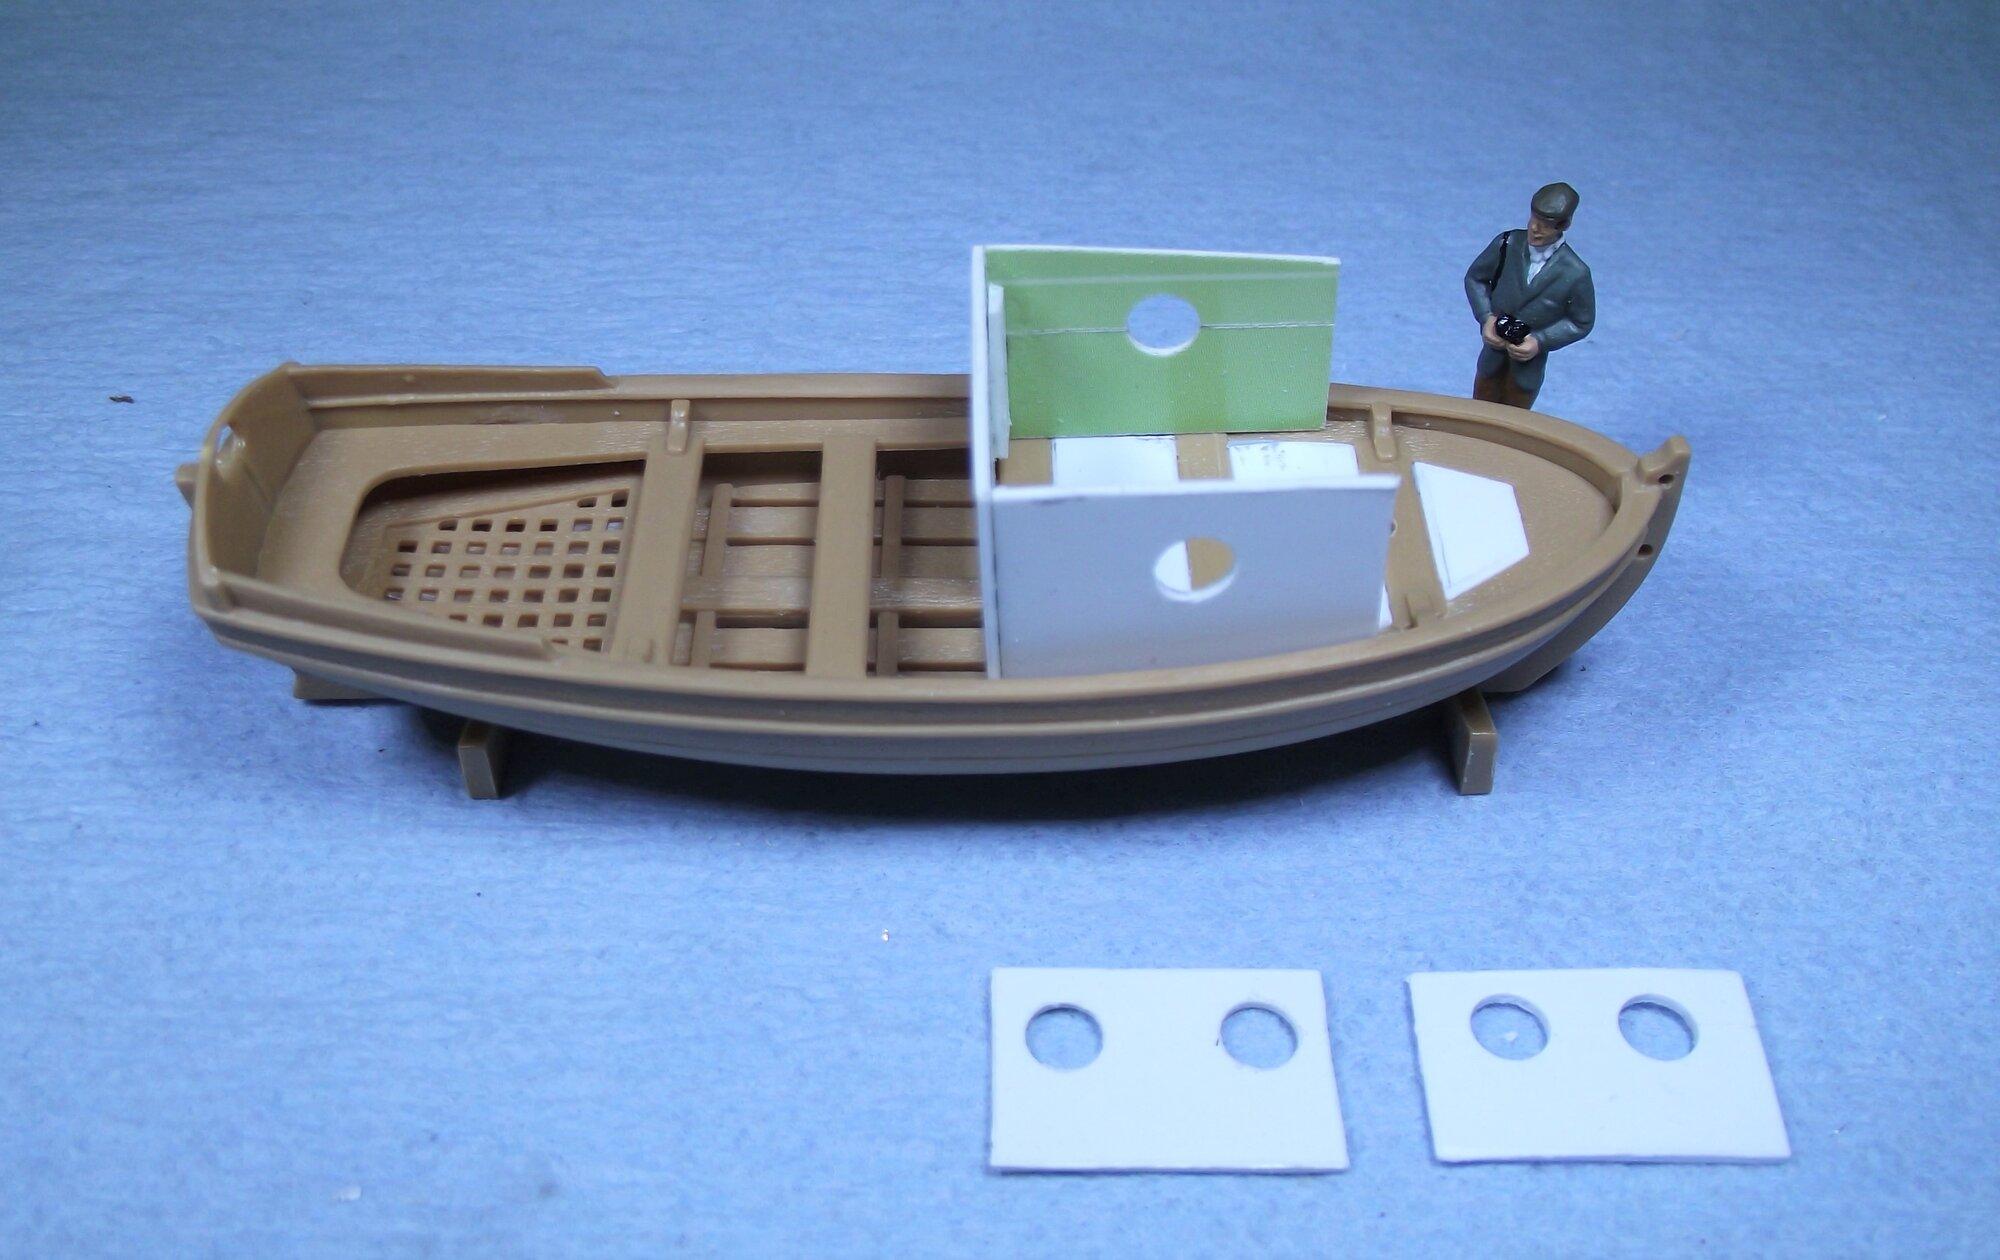 Boat_04-26-2021 (2).jpg